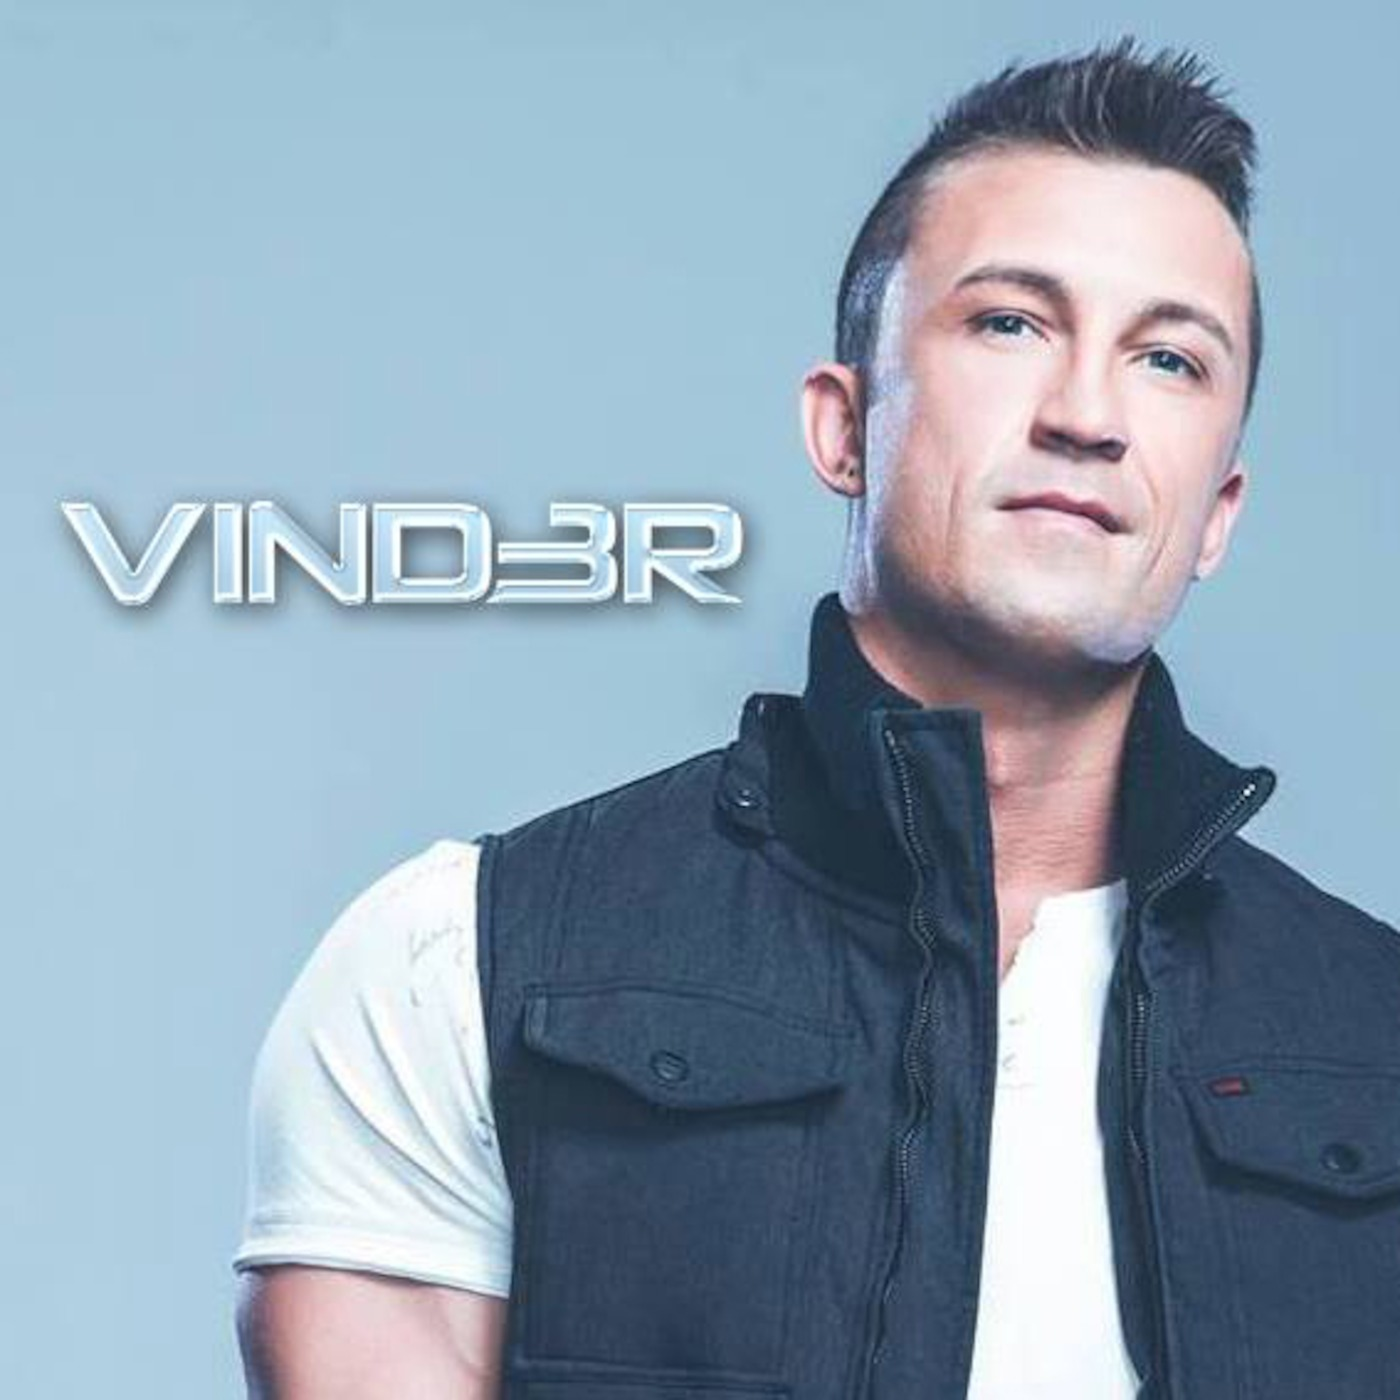 VIND3R Music